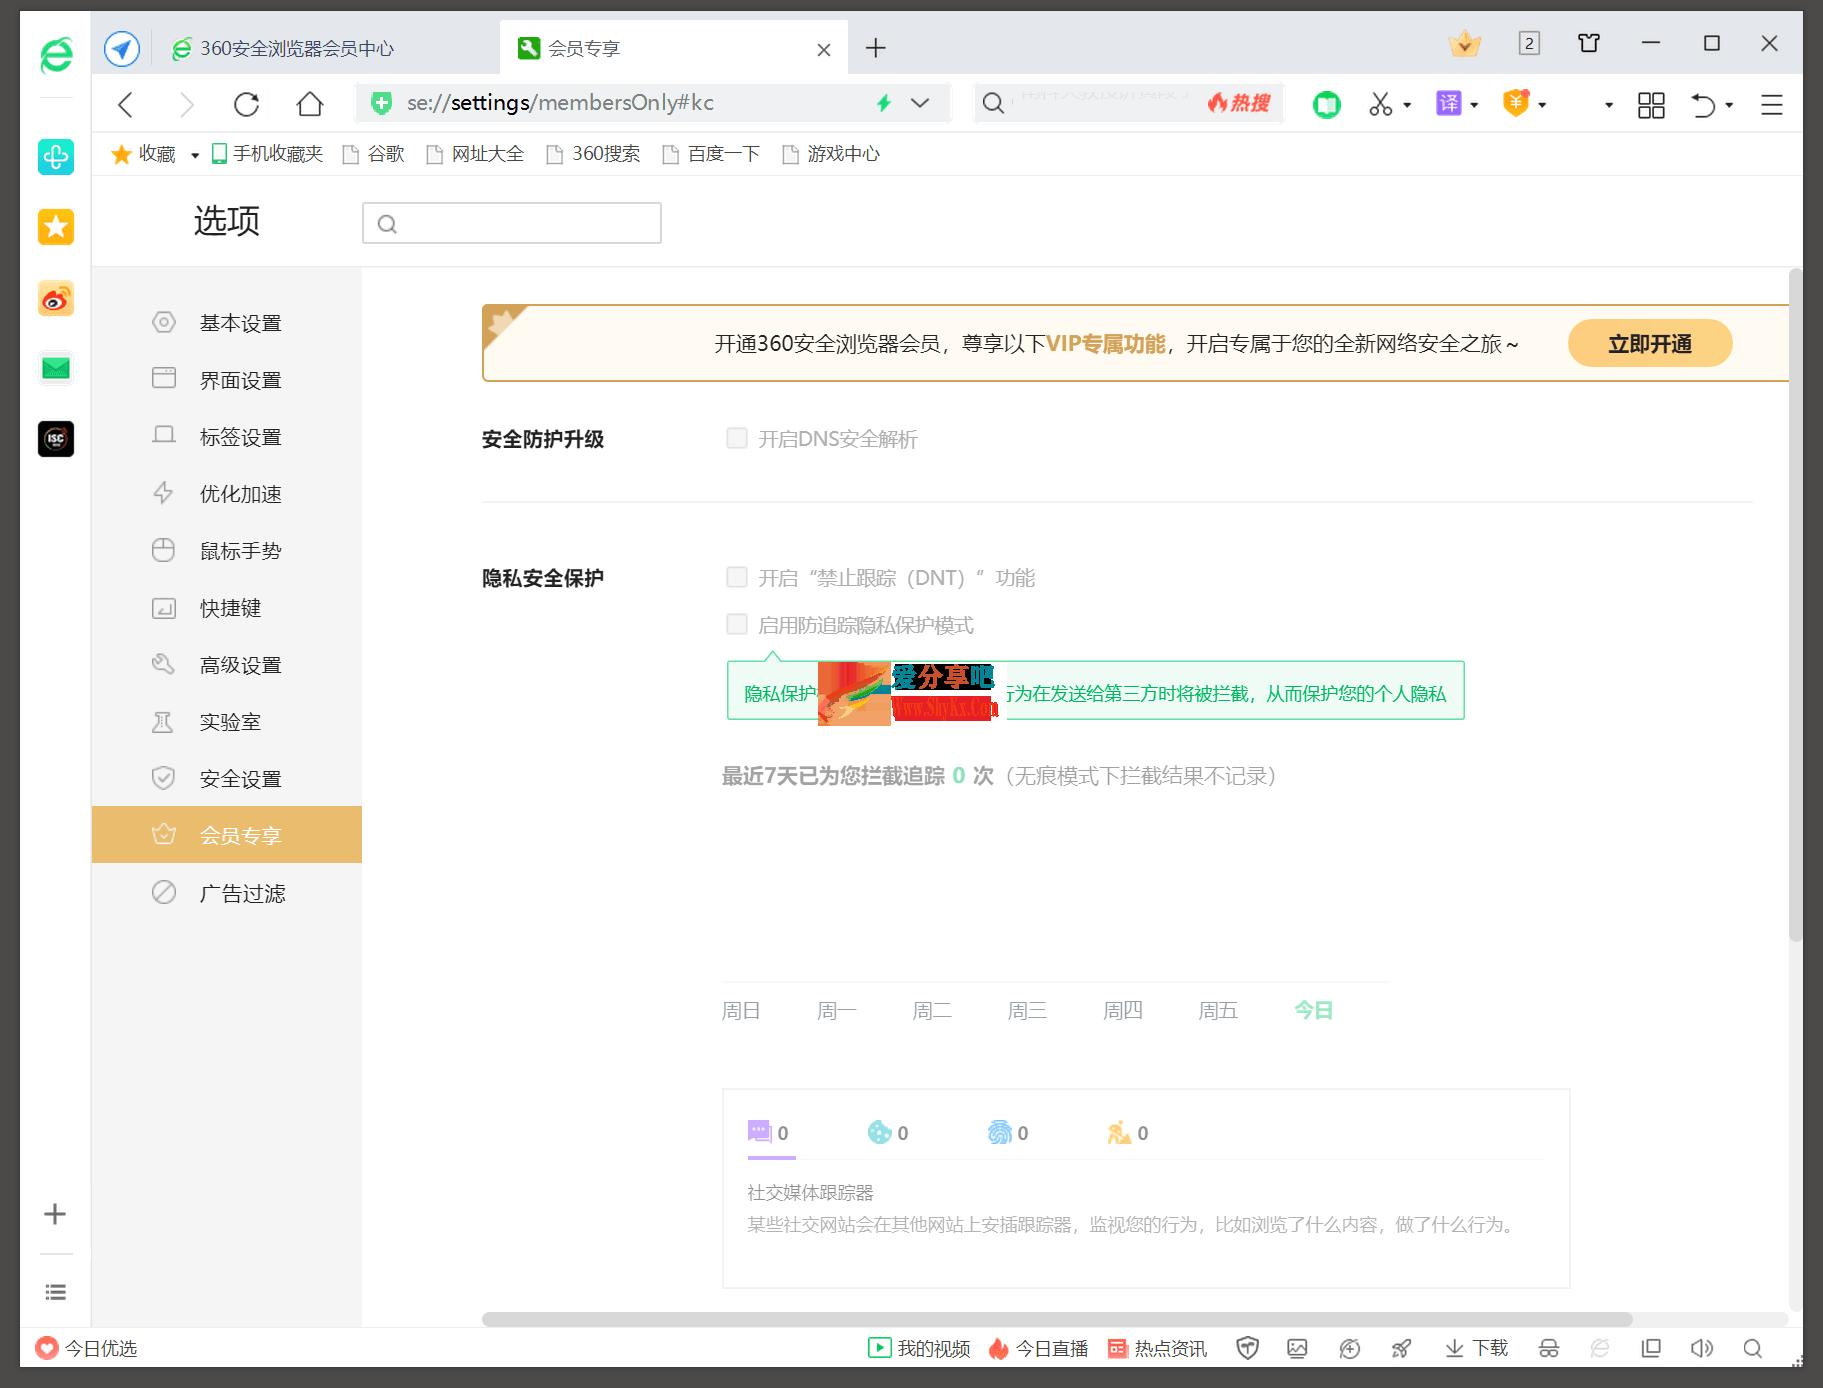 1.png 知名国产360浏览器发布VIP会员功能 行业资讯